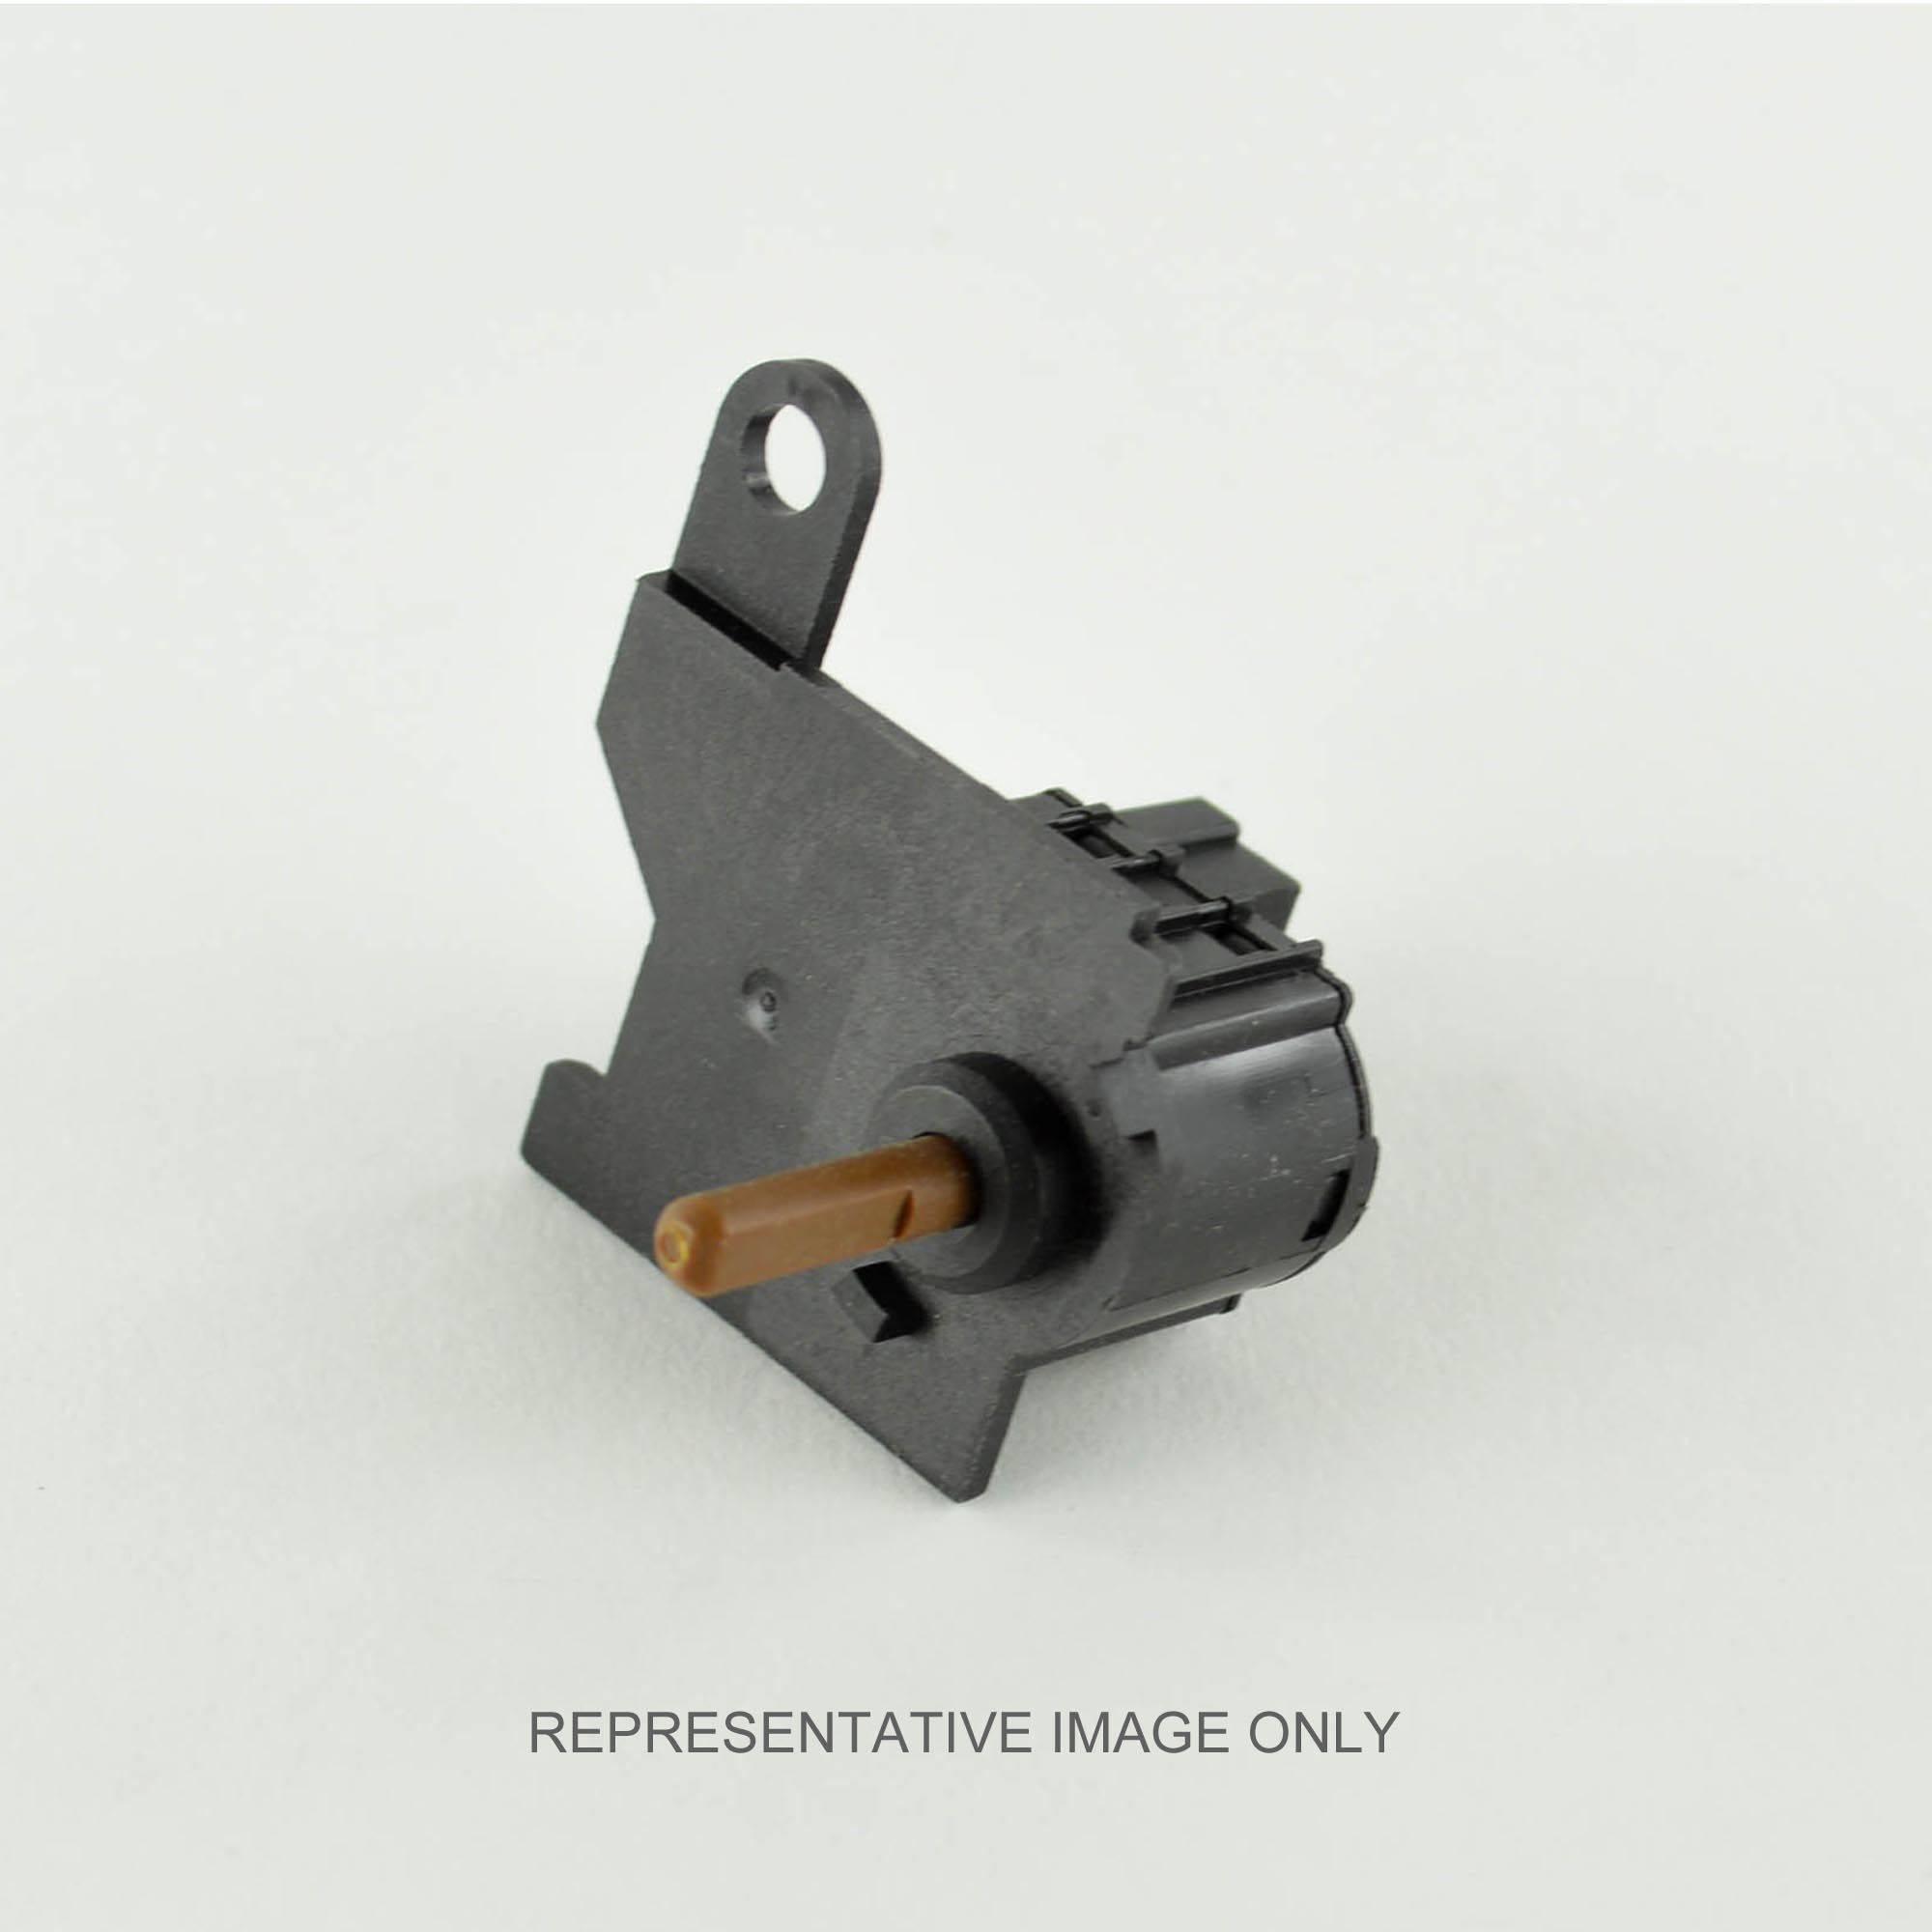 Motorcraft Ambient Temp Switch, MTCH1515